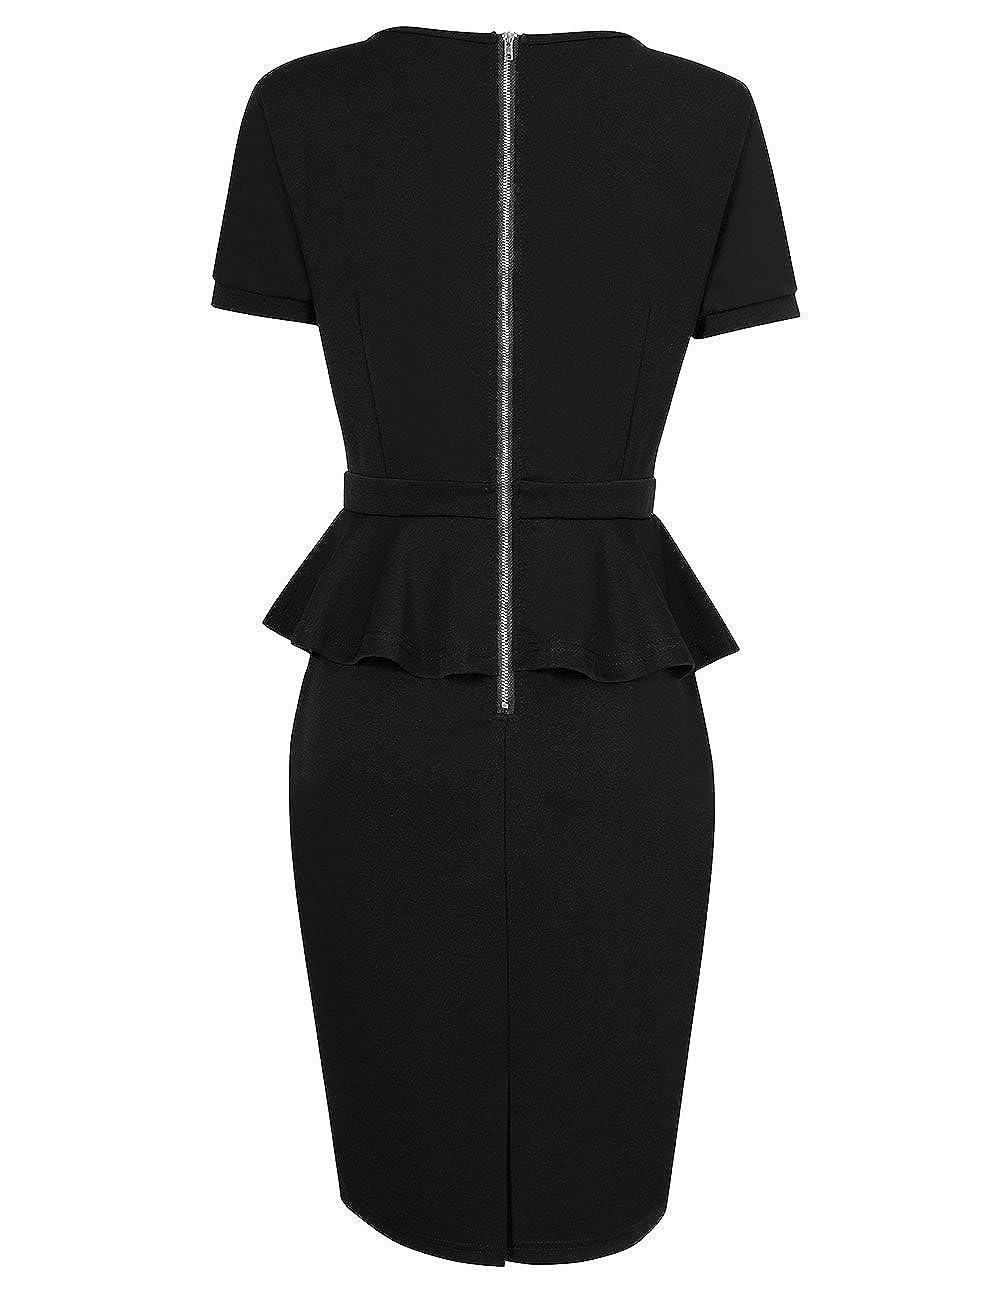 507b0b24c81 Zehui Women s 3 4 Sleeve Maxi Dress Long Babydoll Casual with  Pockets